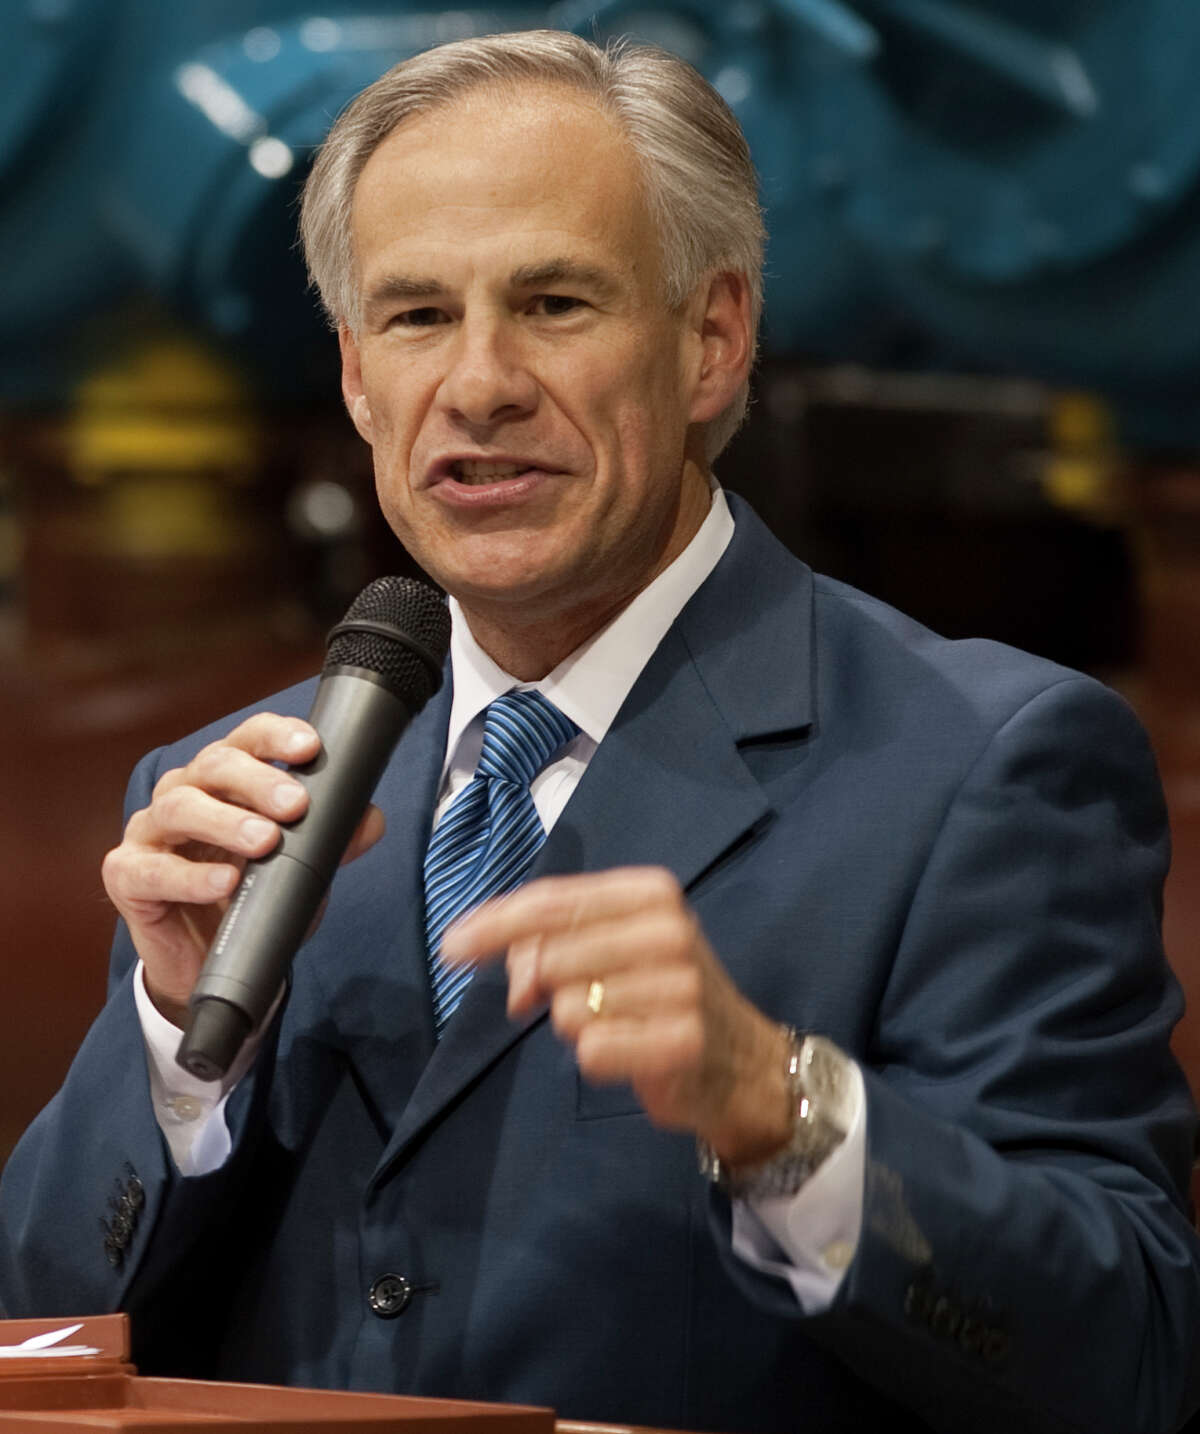 Gov. Greg Abbott says he will ask the Legislature to revisit ethics reform in 2017.